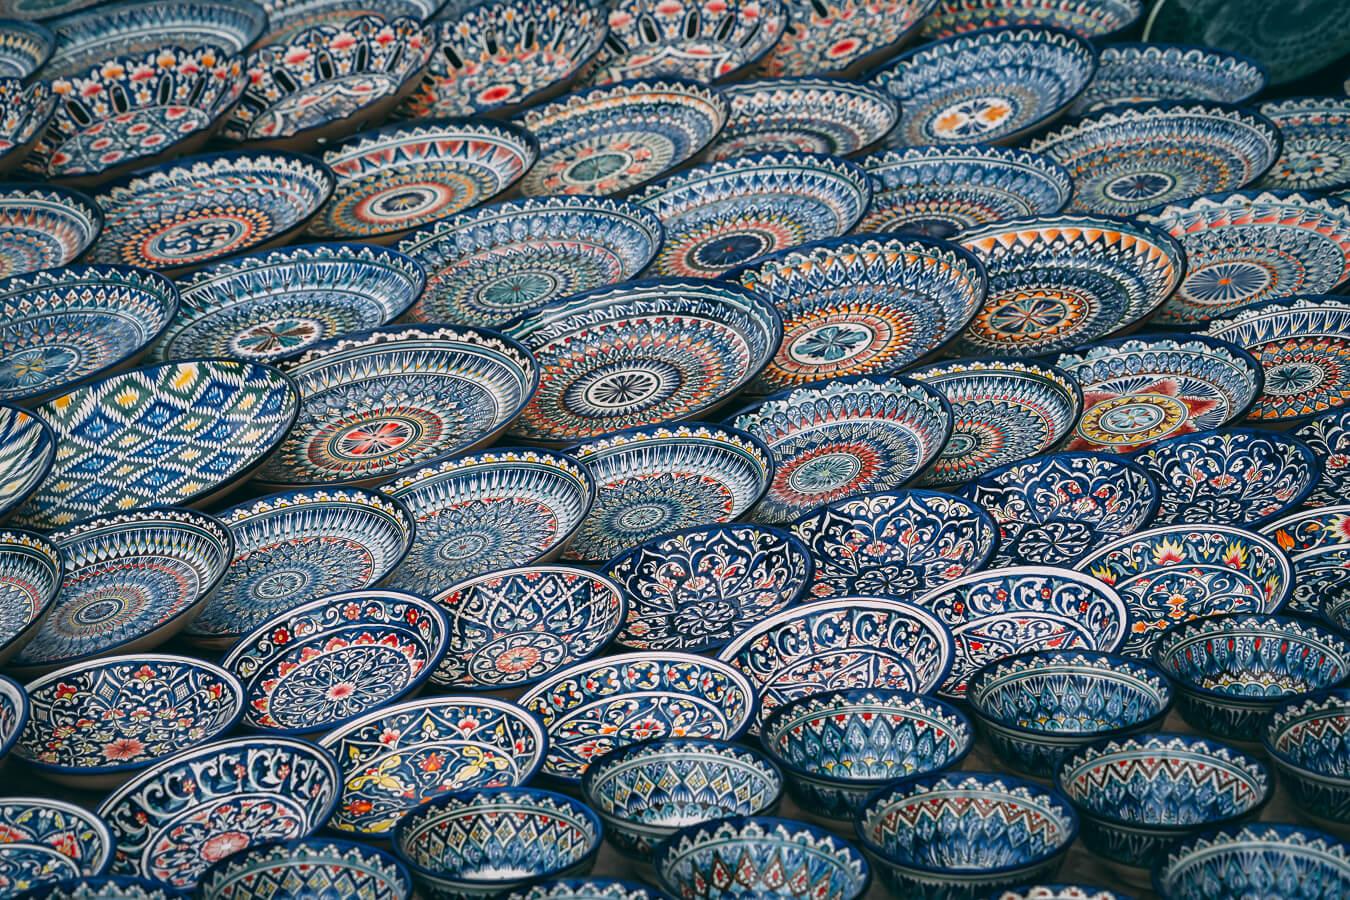 Uzbekistan ceramic colorful plates